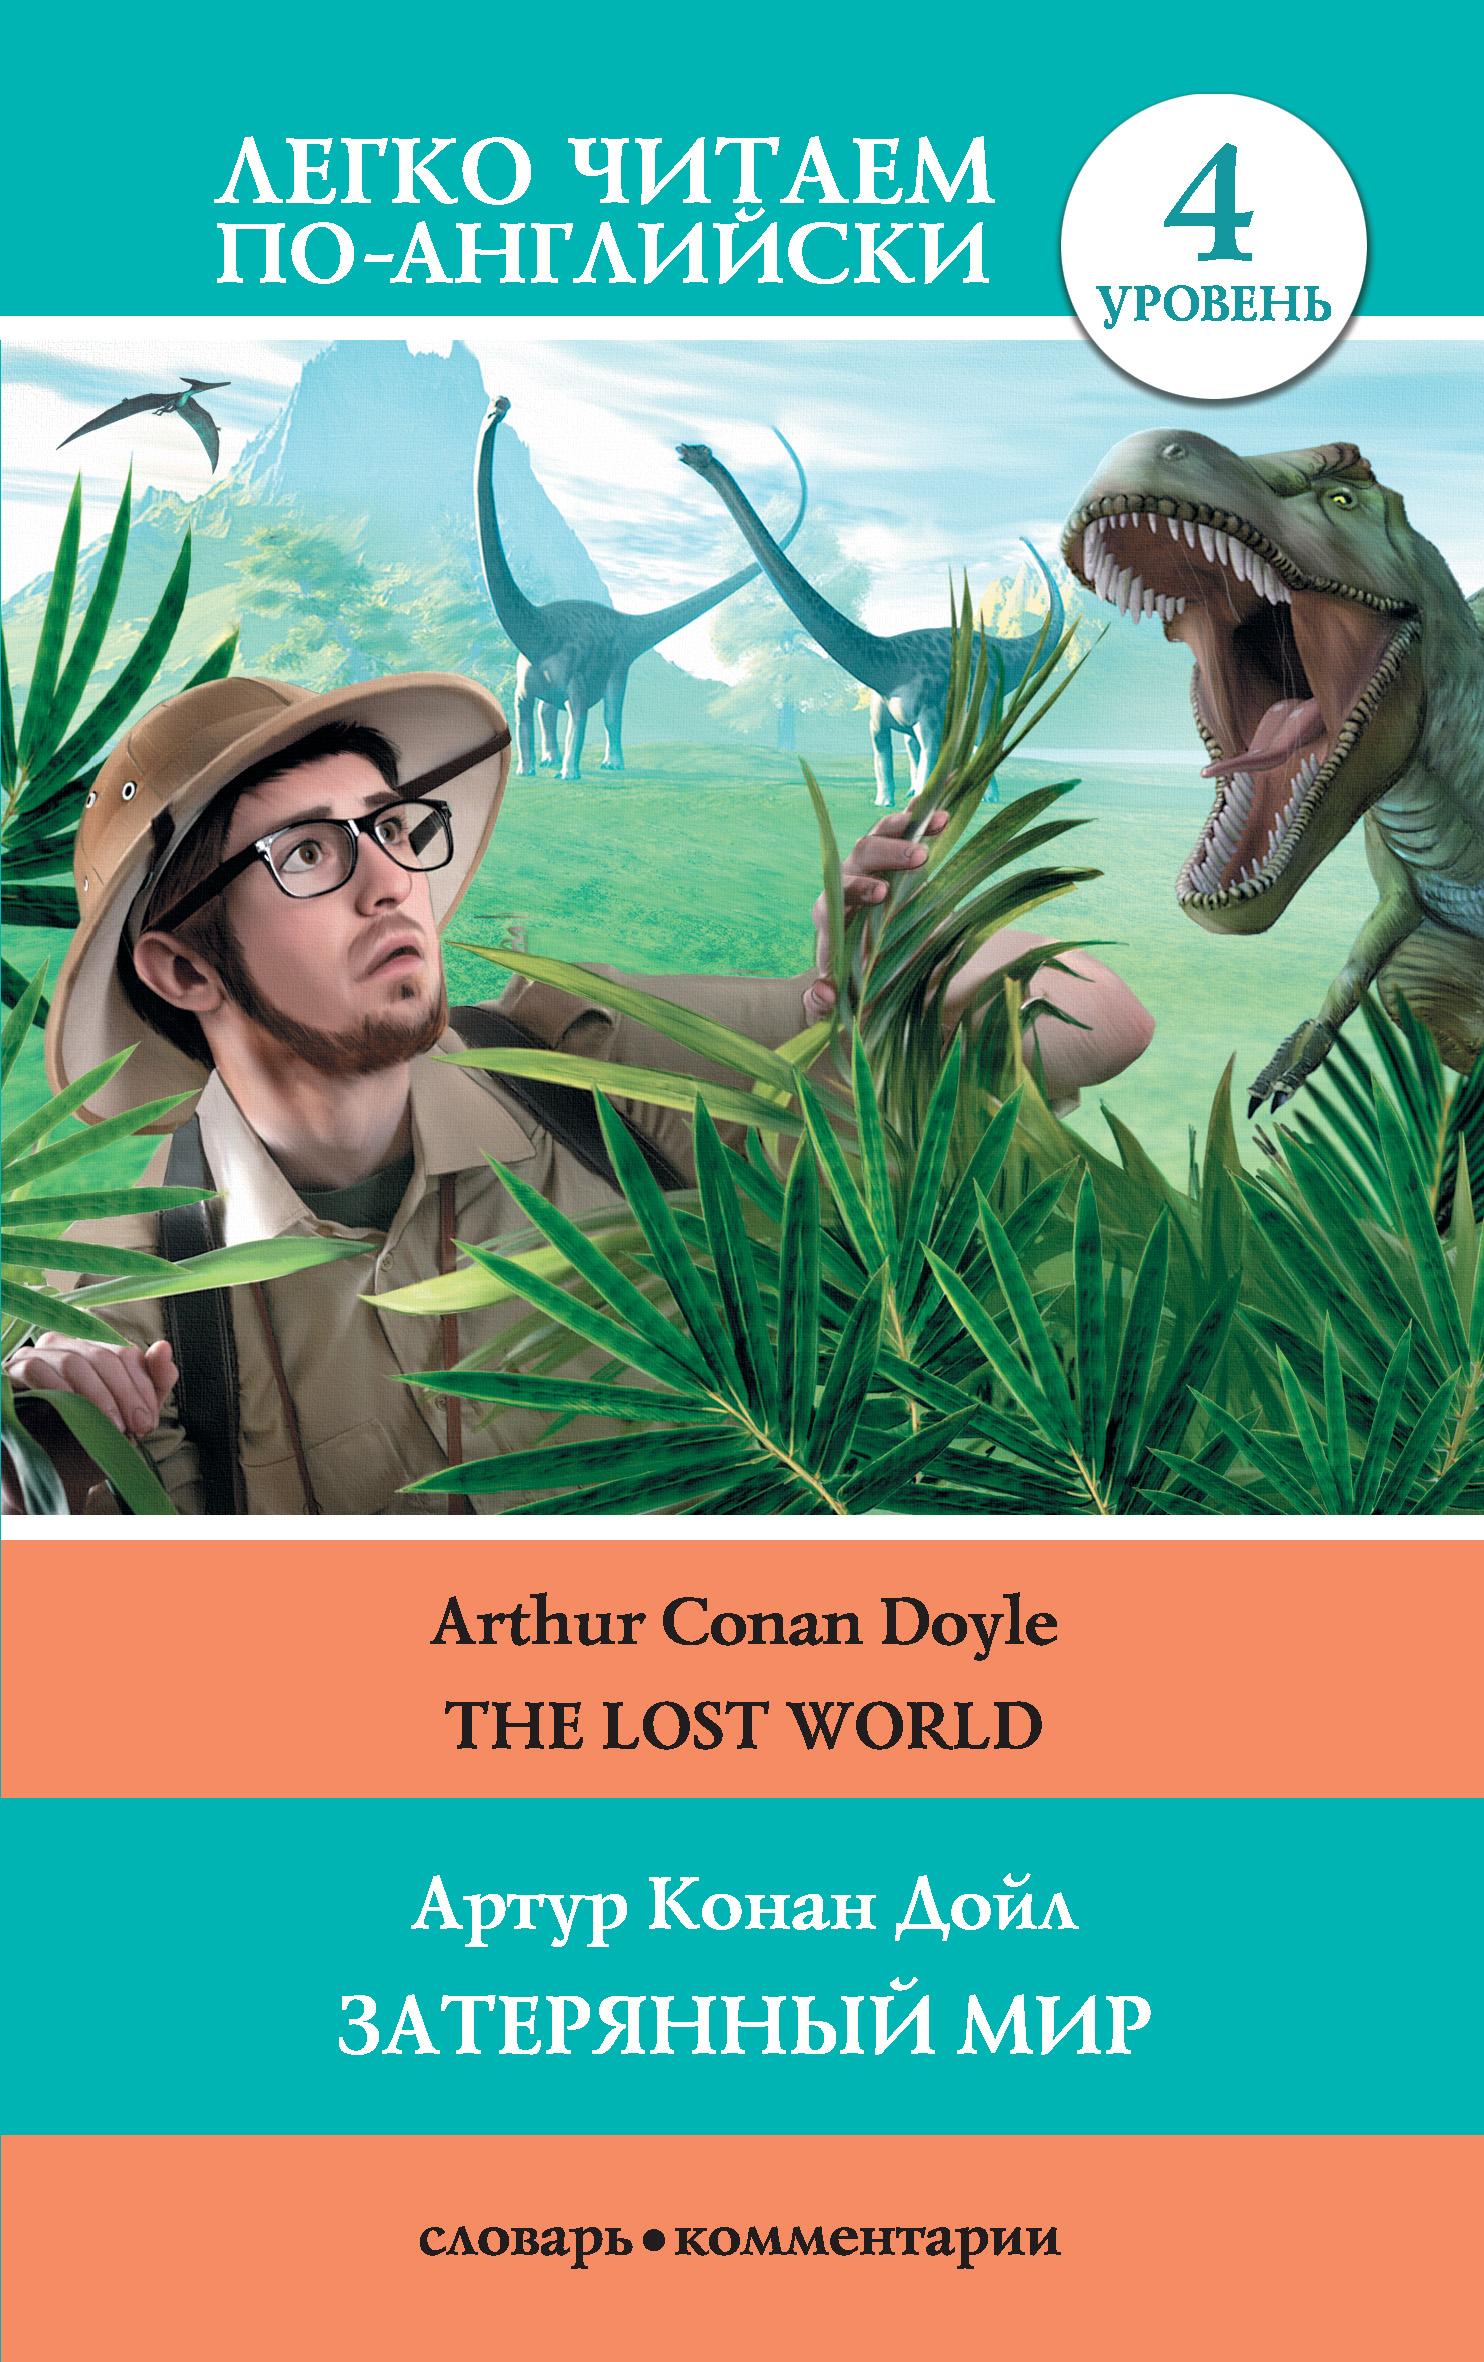 Артур Конан Дойл The Lost World / Затерянный мир айрис пресс билингва затерянный мир the lost world комплект с mp3